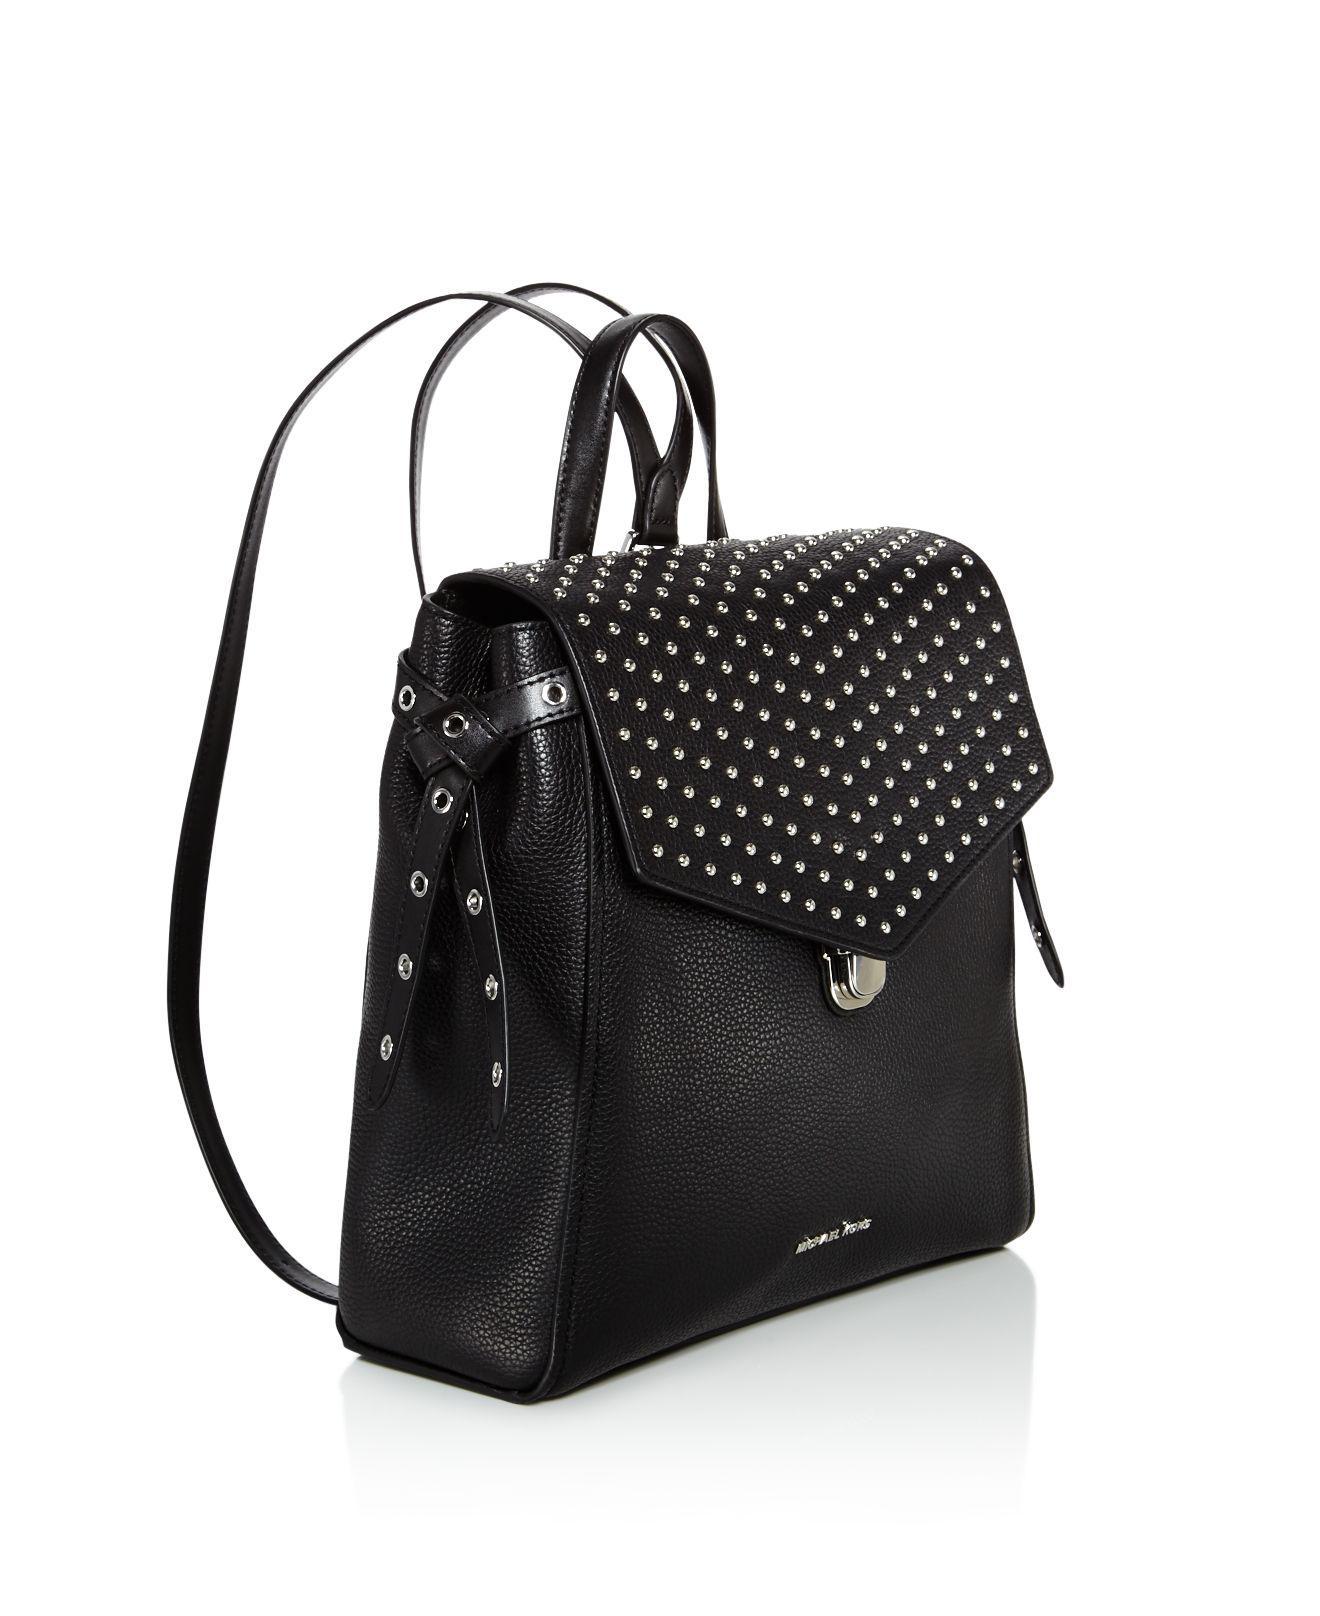 6ff2a2db627e Cheap Michael Kors Backpack Sale - MK Bags Outlet. Buy Michael Kors  Backpacks Bristol Medium Studded Leather Backpack Pearl Grey ...